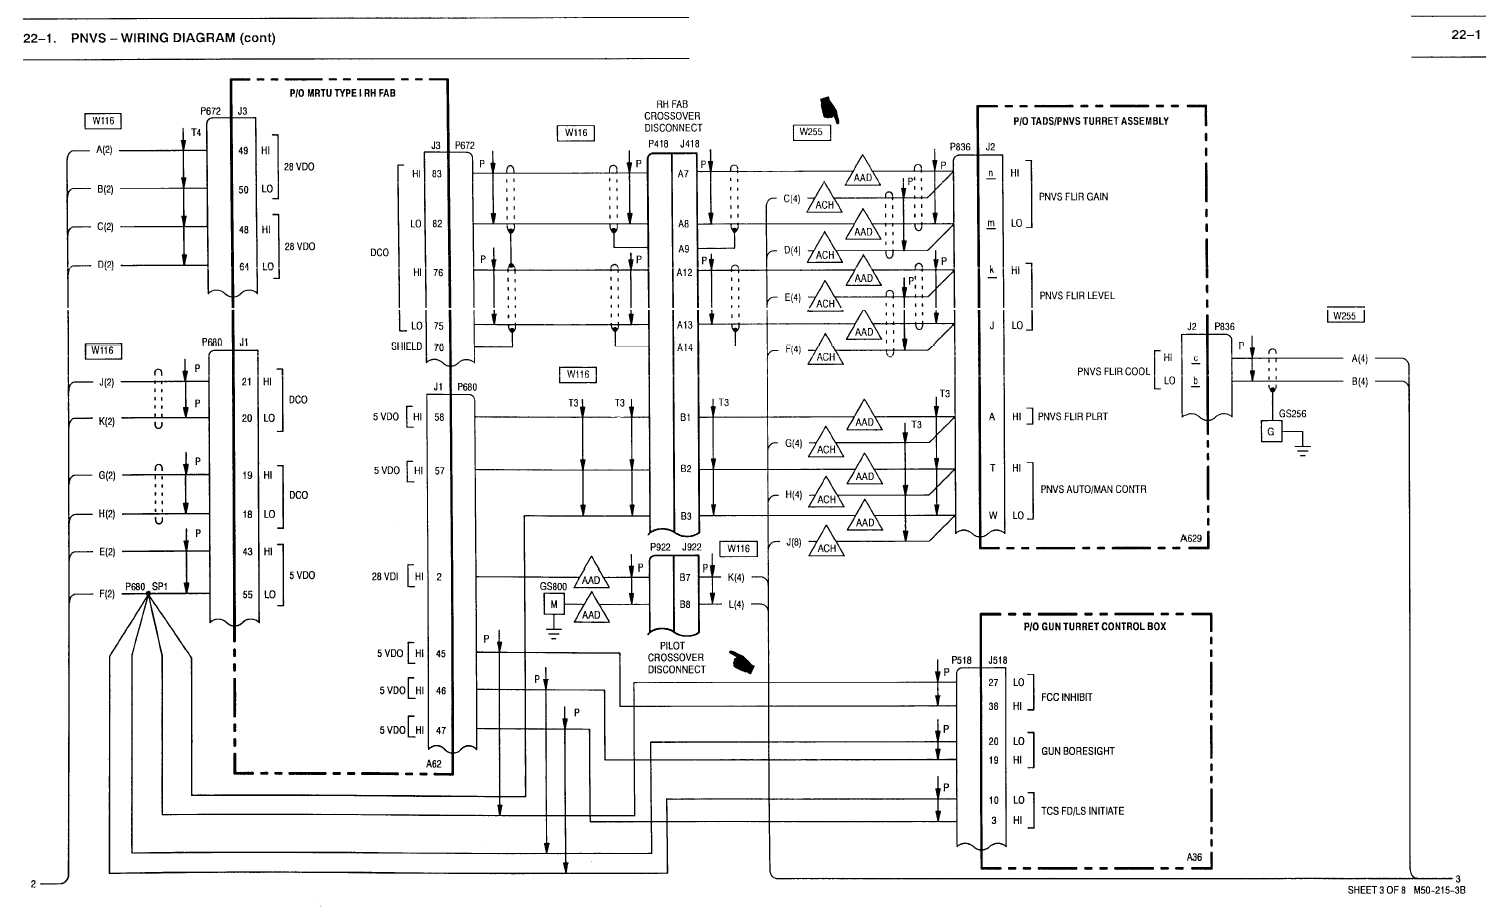 22 1 pnvs wiring diagram cont tm 1 1520 238 t 10 551. Black Bedroom Furniture Sets. Home Design Ideas